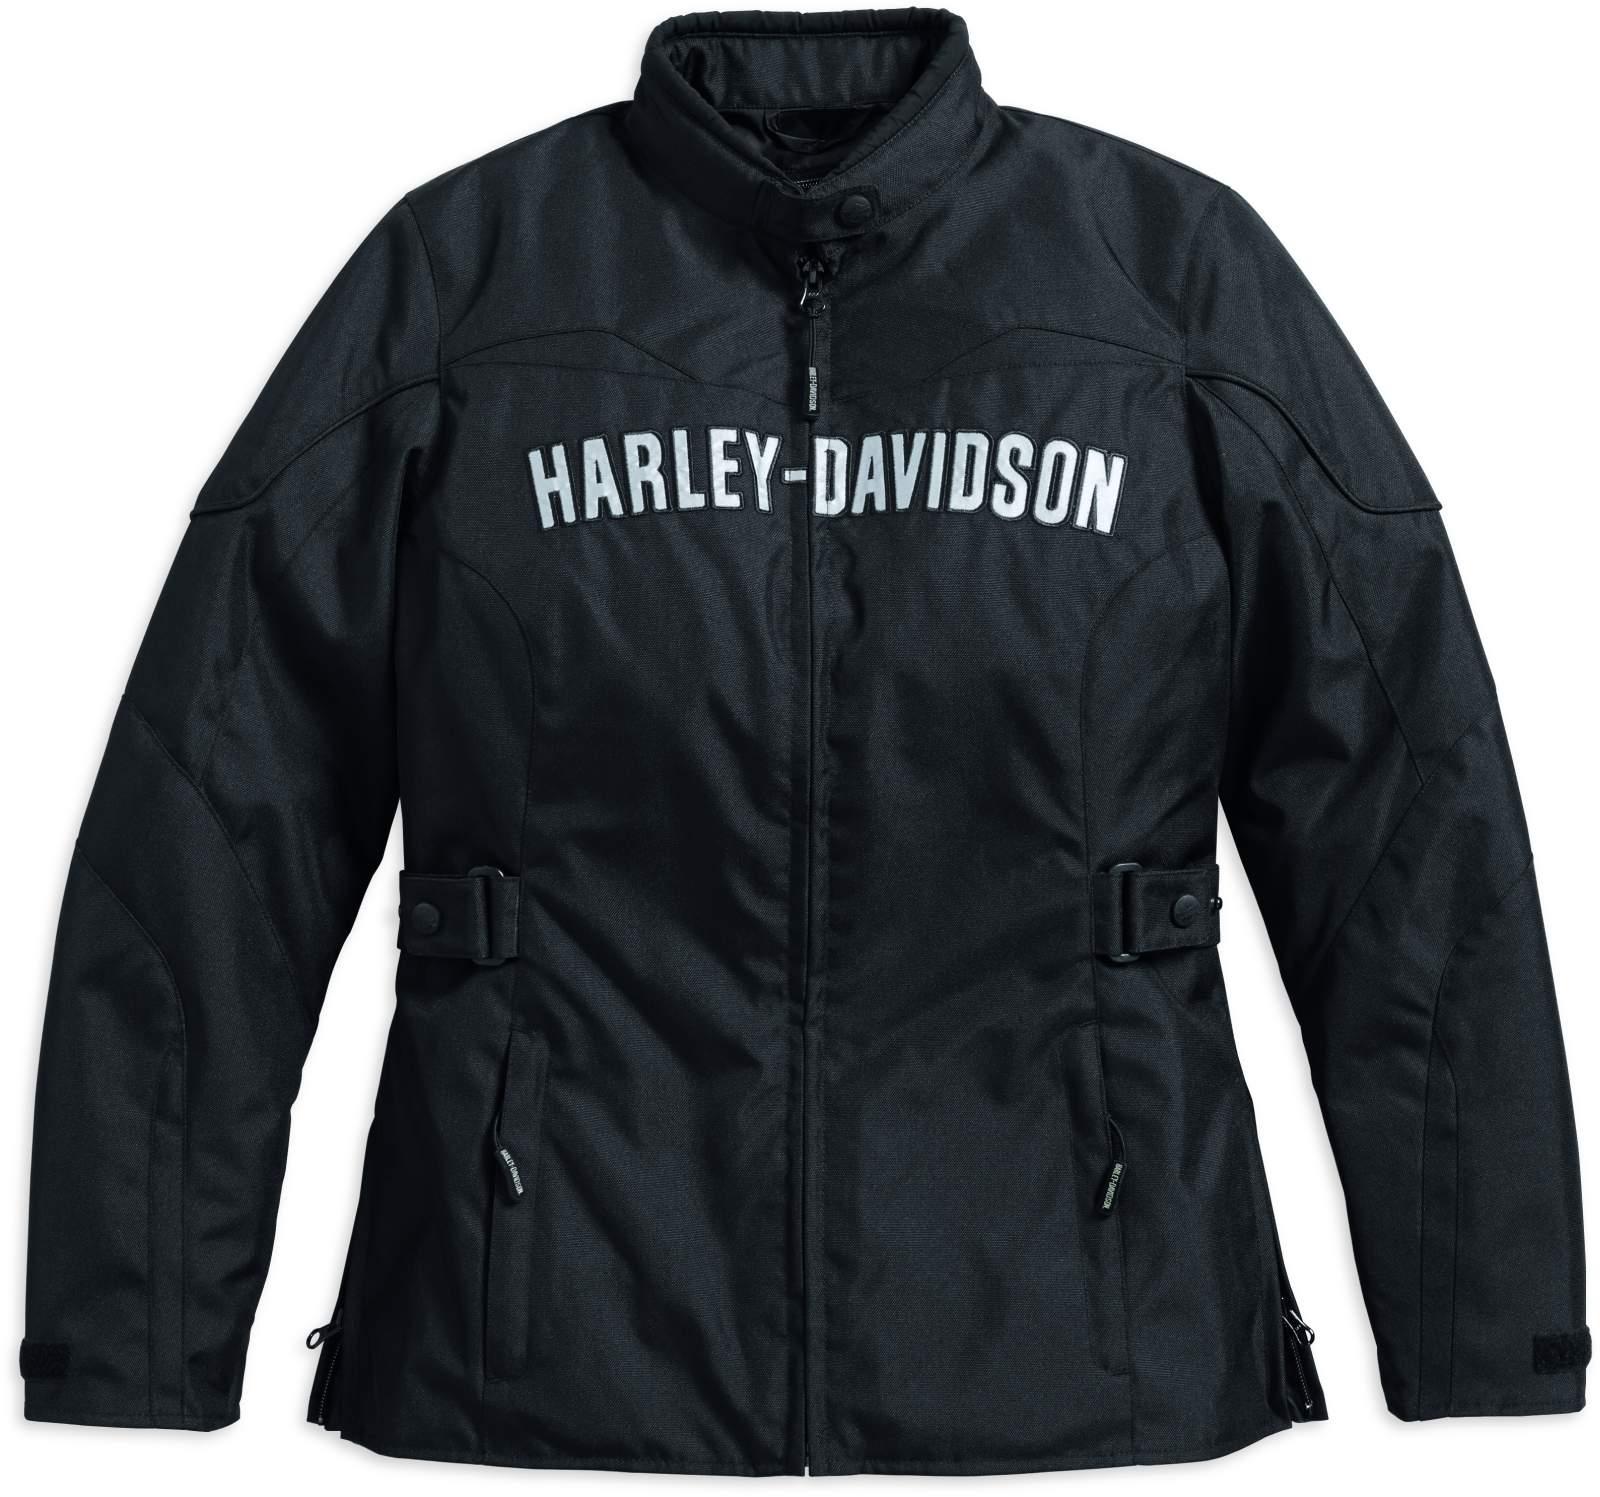 98172 17ew harley davidson damen textiljacke classic ec im thunderbike shop. Black Bedroom Furniture Sets. Home Design Ideas